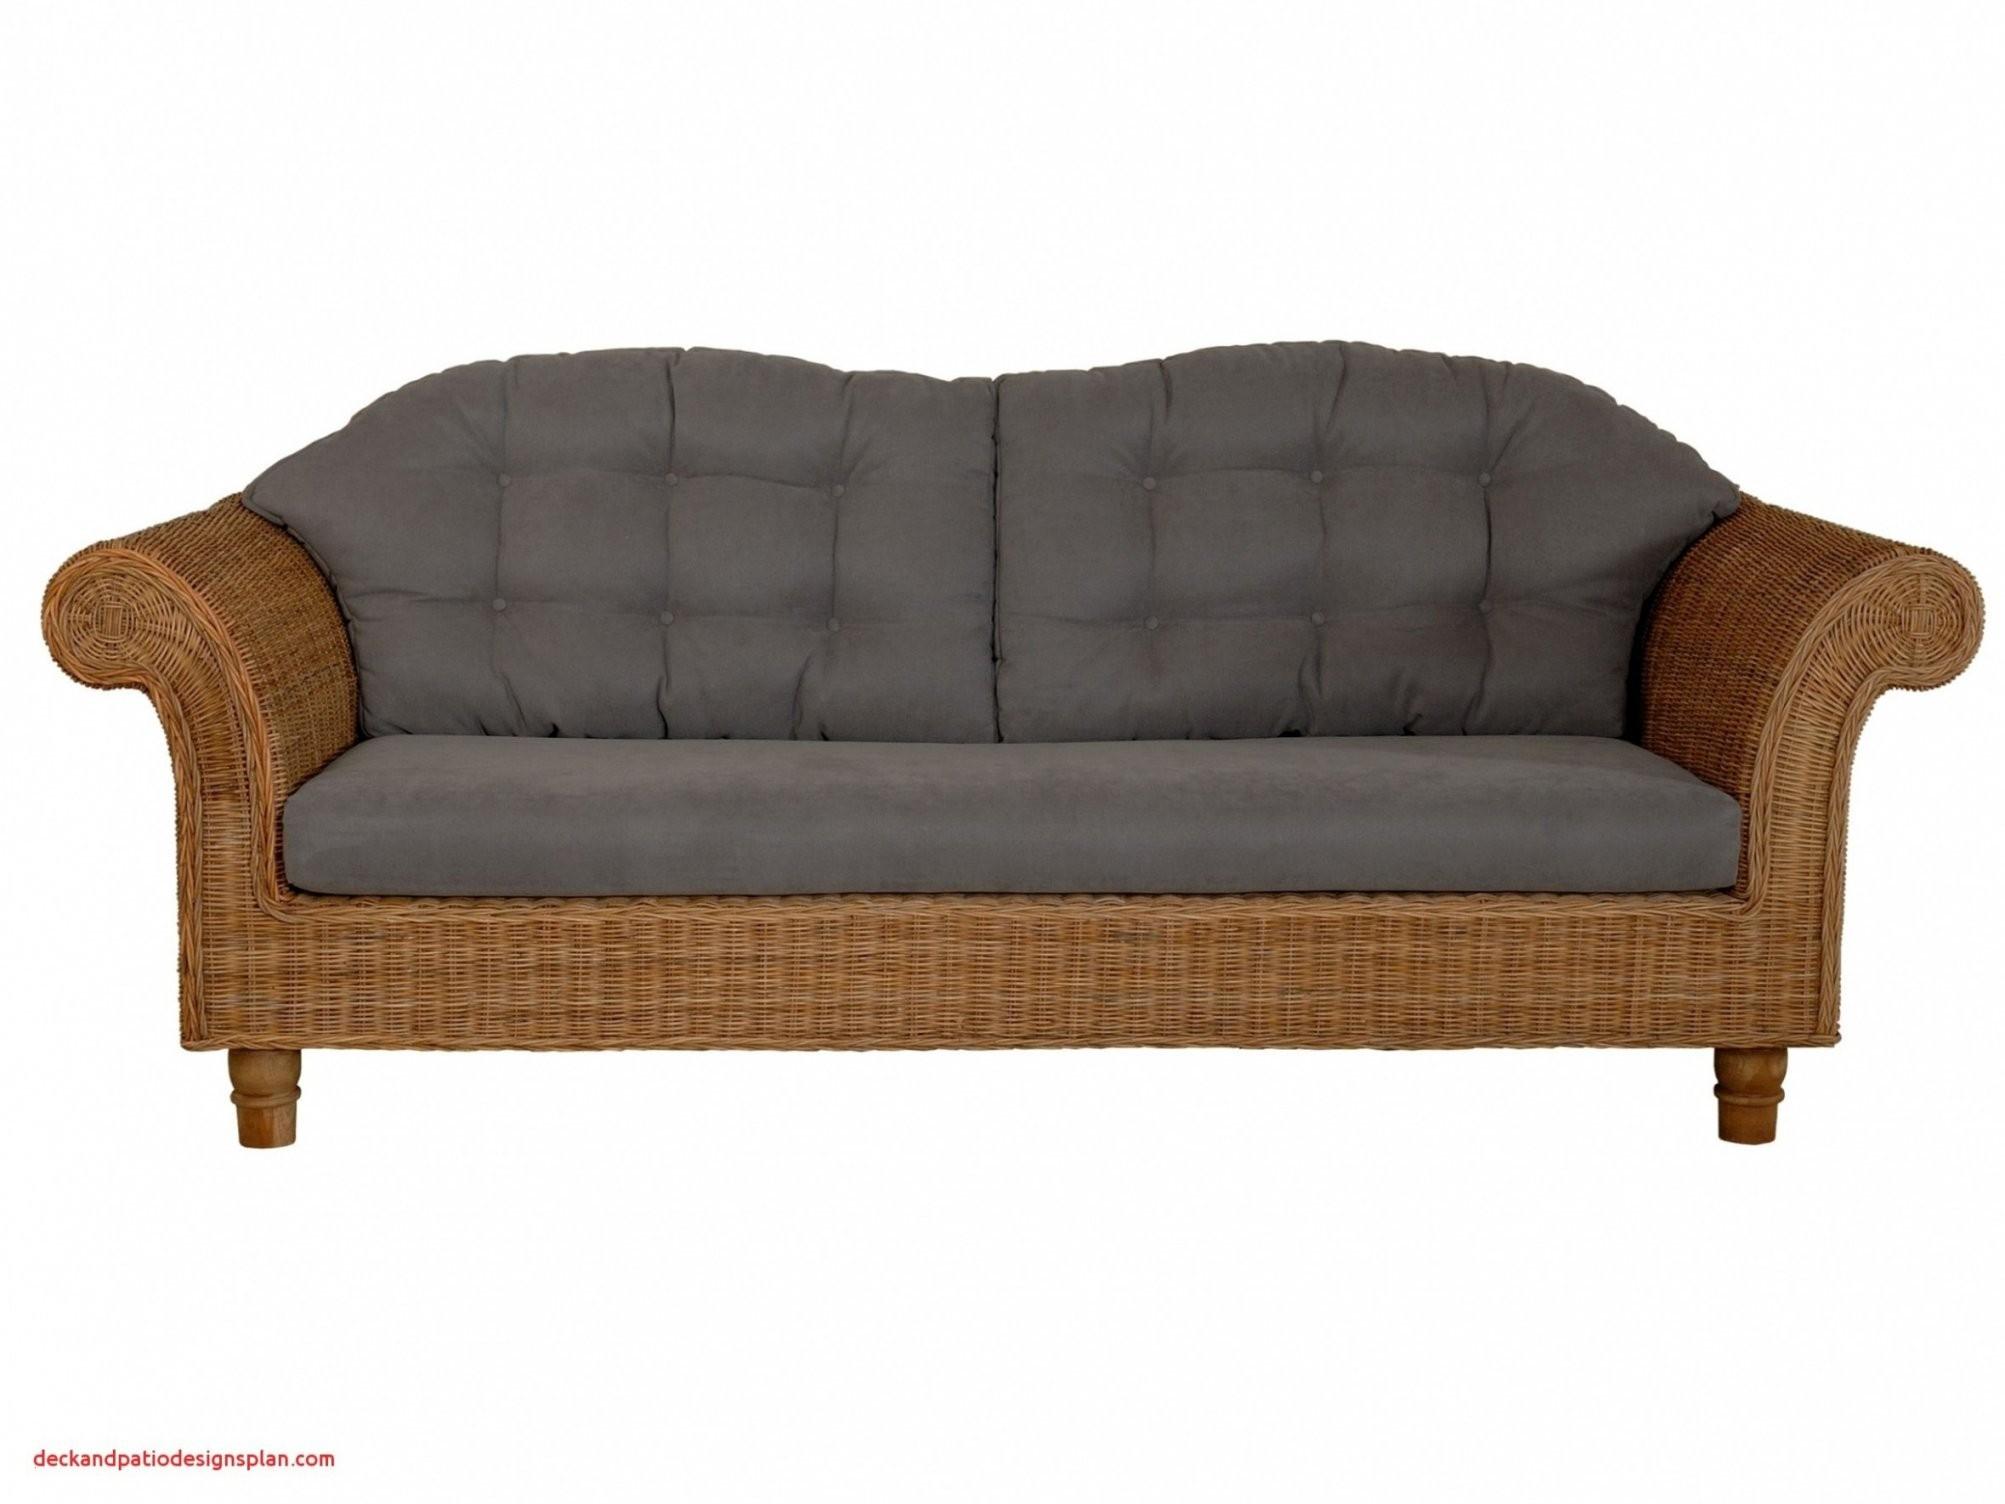 41 Neu 3 Sitzer Sofa  Lapetitemaisonnyc von Polyrattan Sofa 3 Sitzer Bild